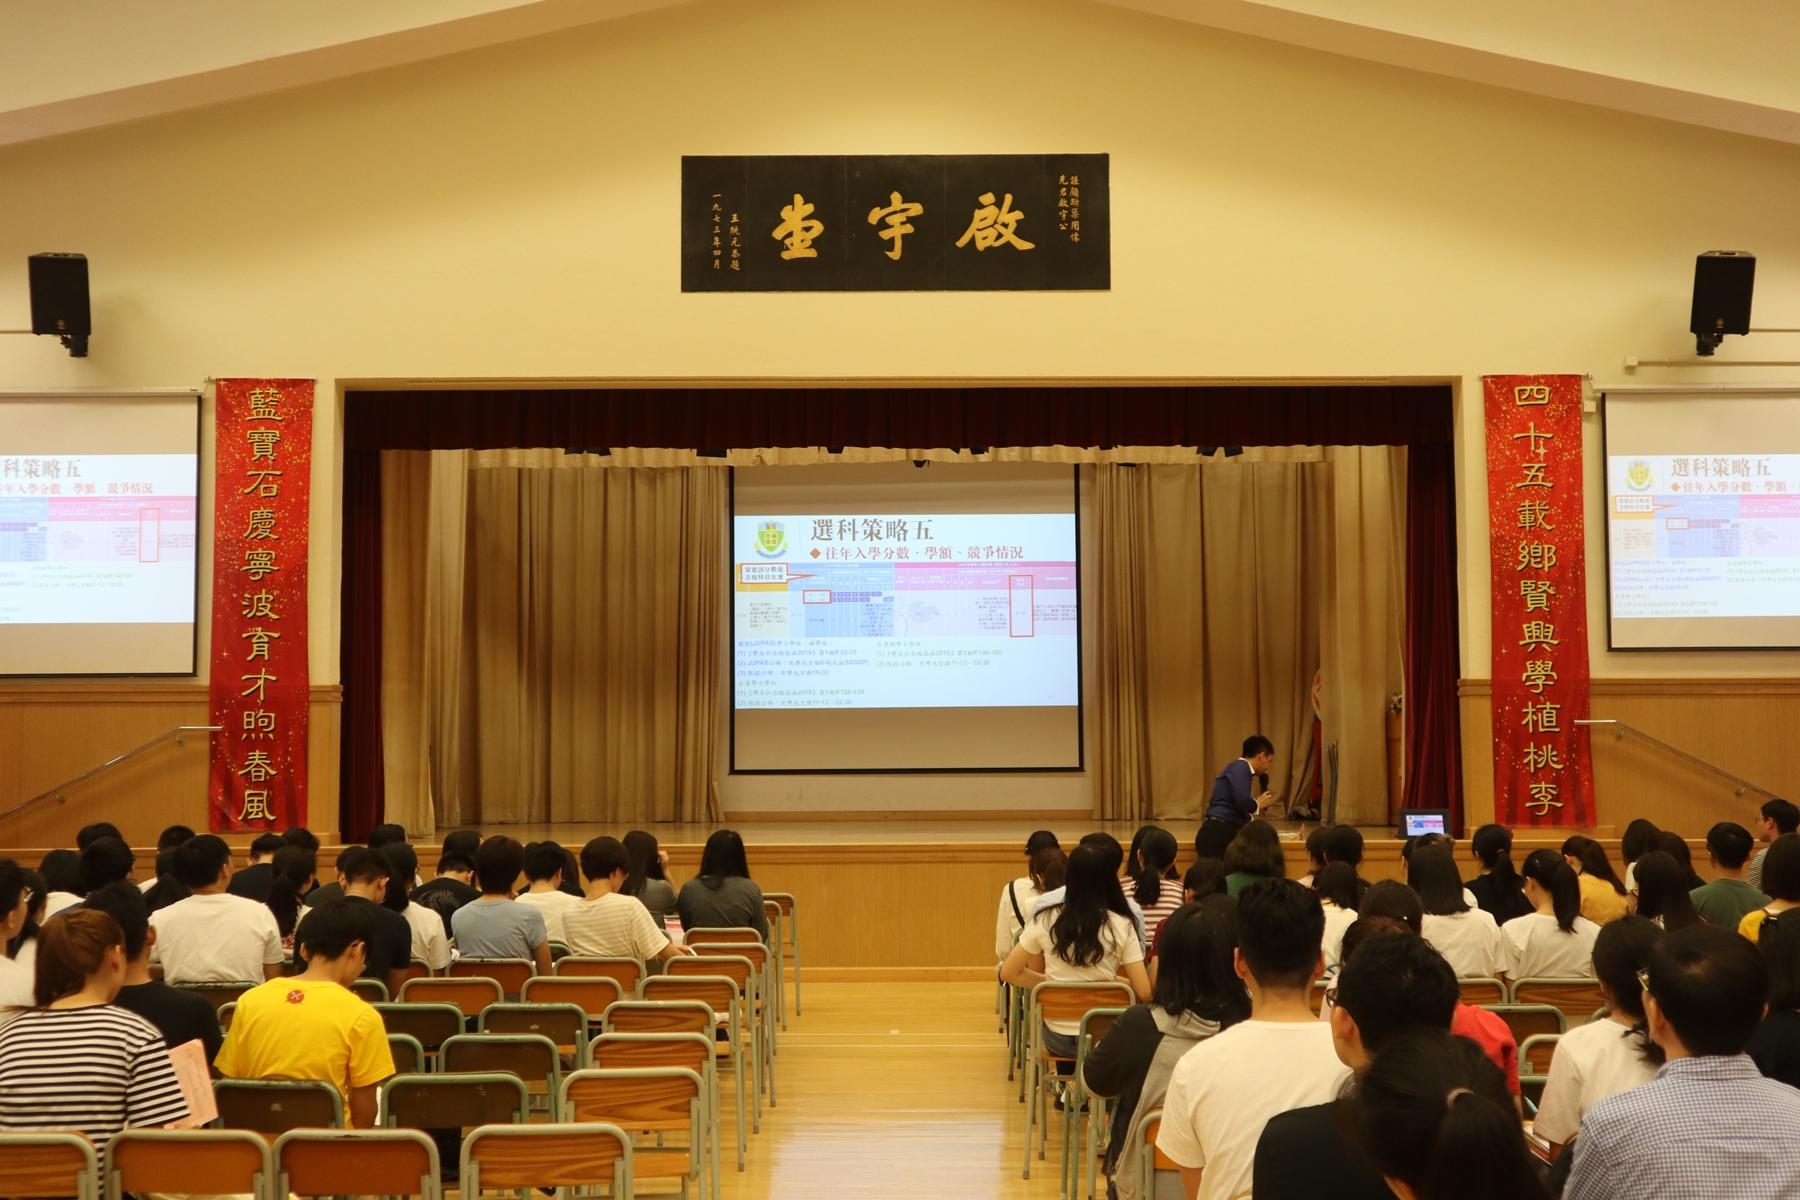 https://npc.edu.hk/sites/default/files/img_9192.jpg